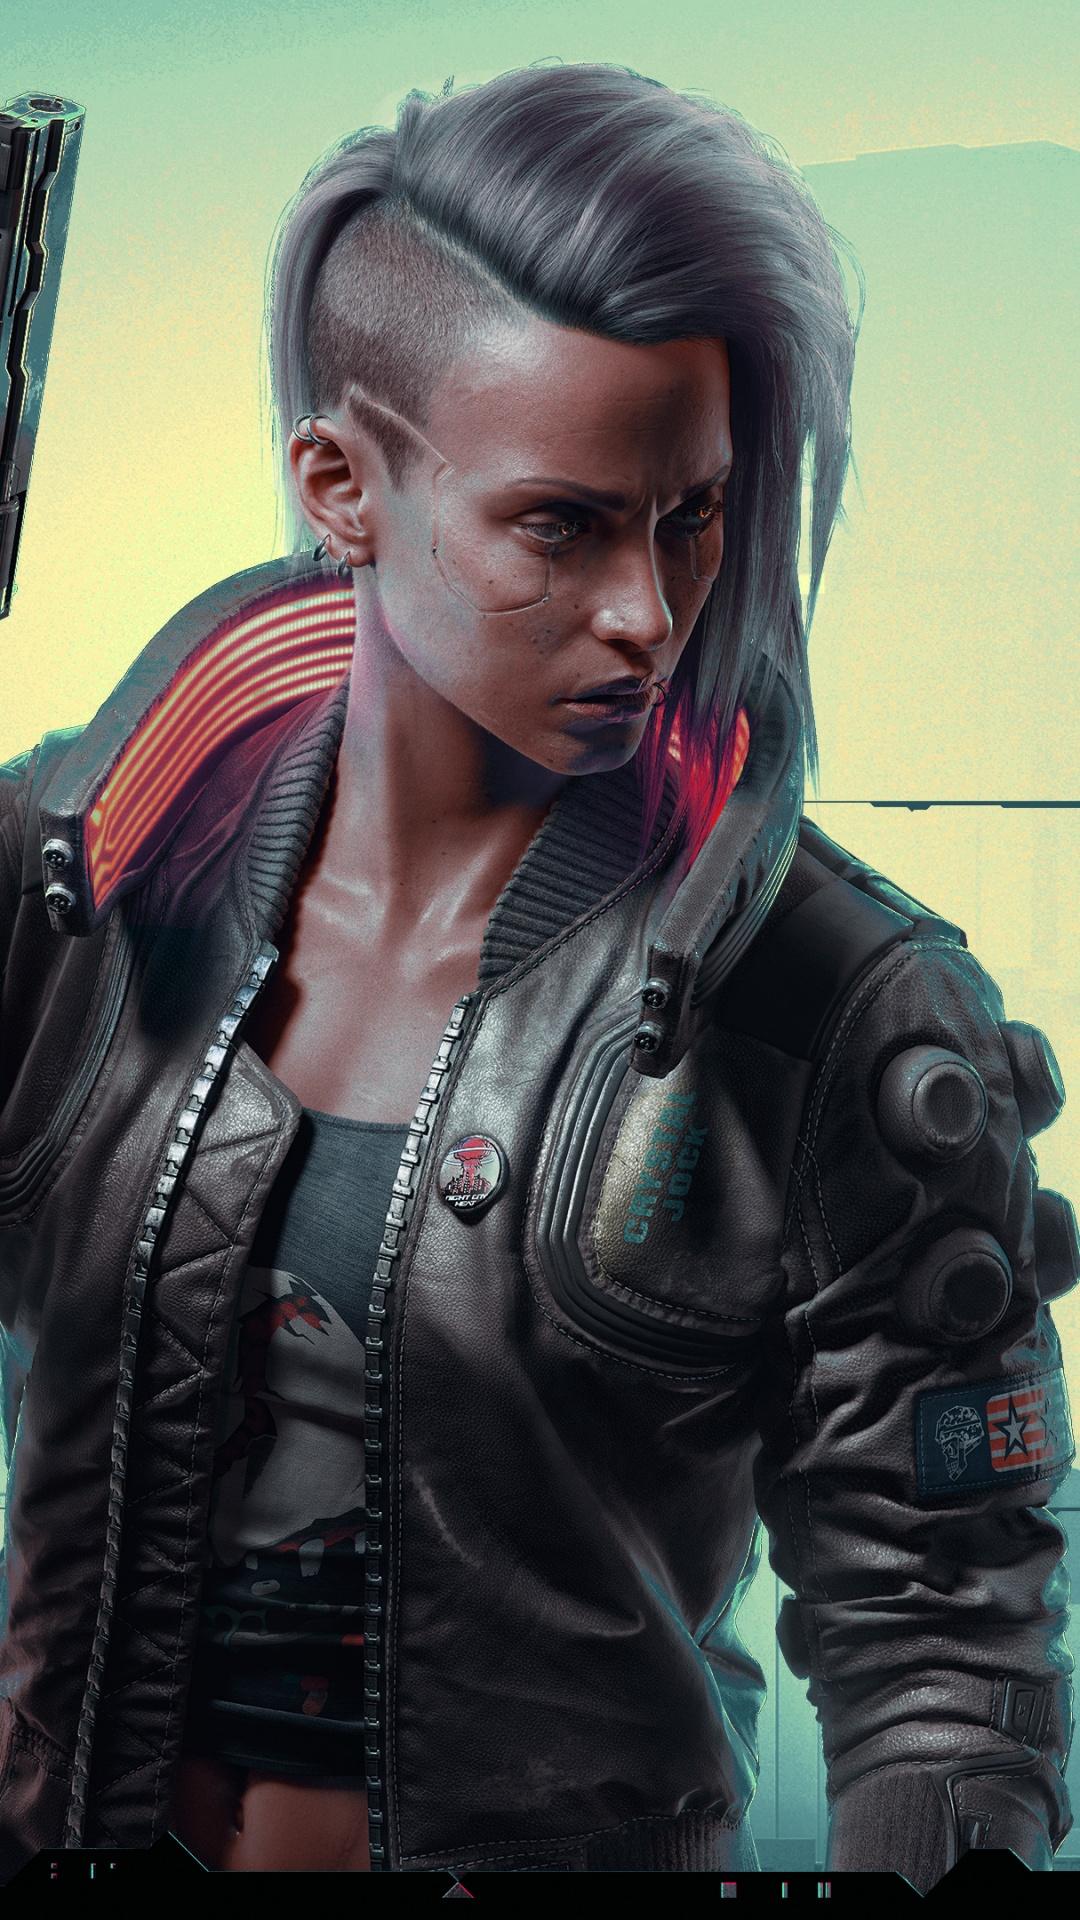 4K Wallpaper Cyberpunk 2077, Female V, 2020 Games, Xbox